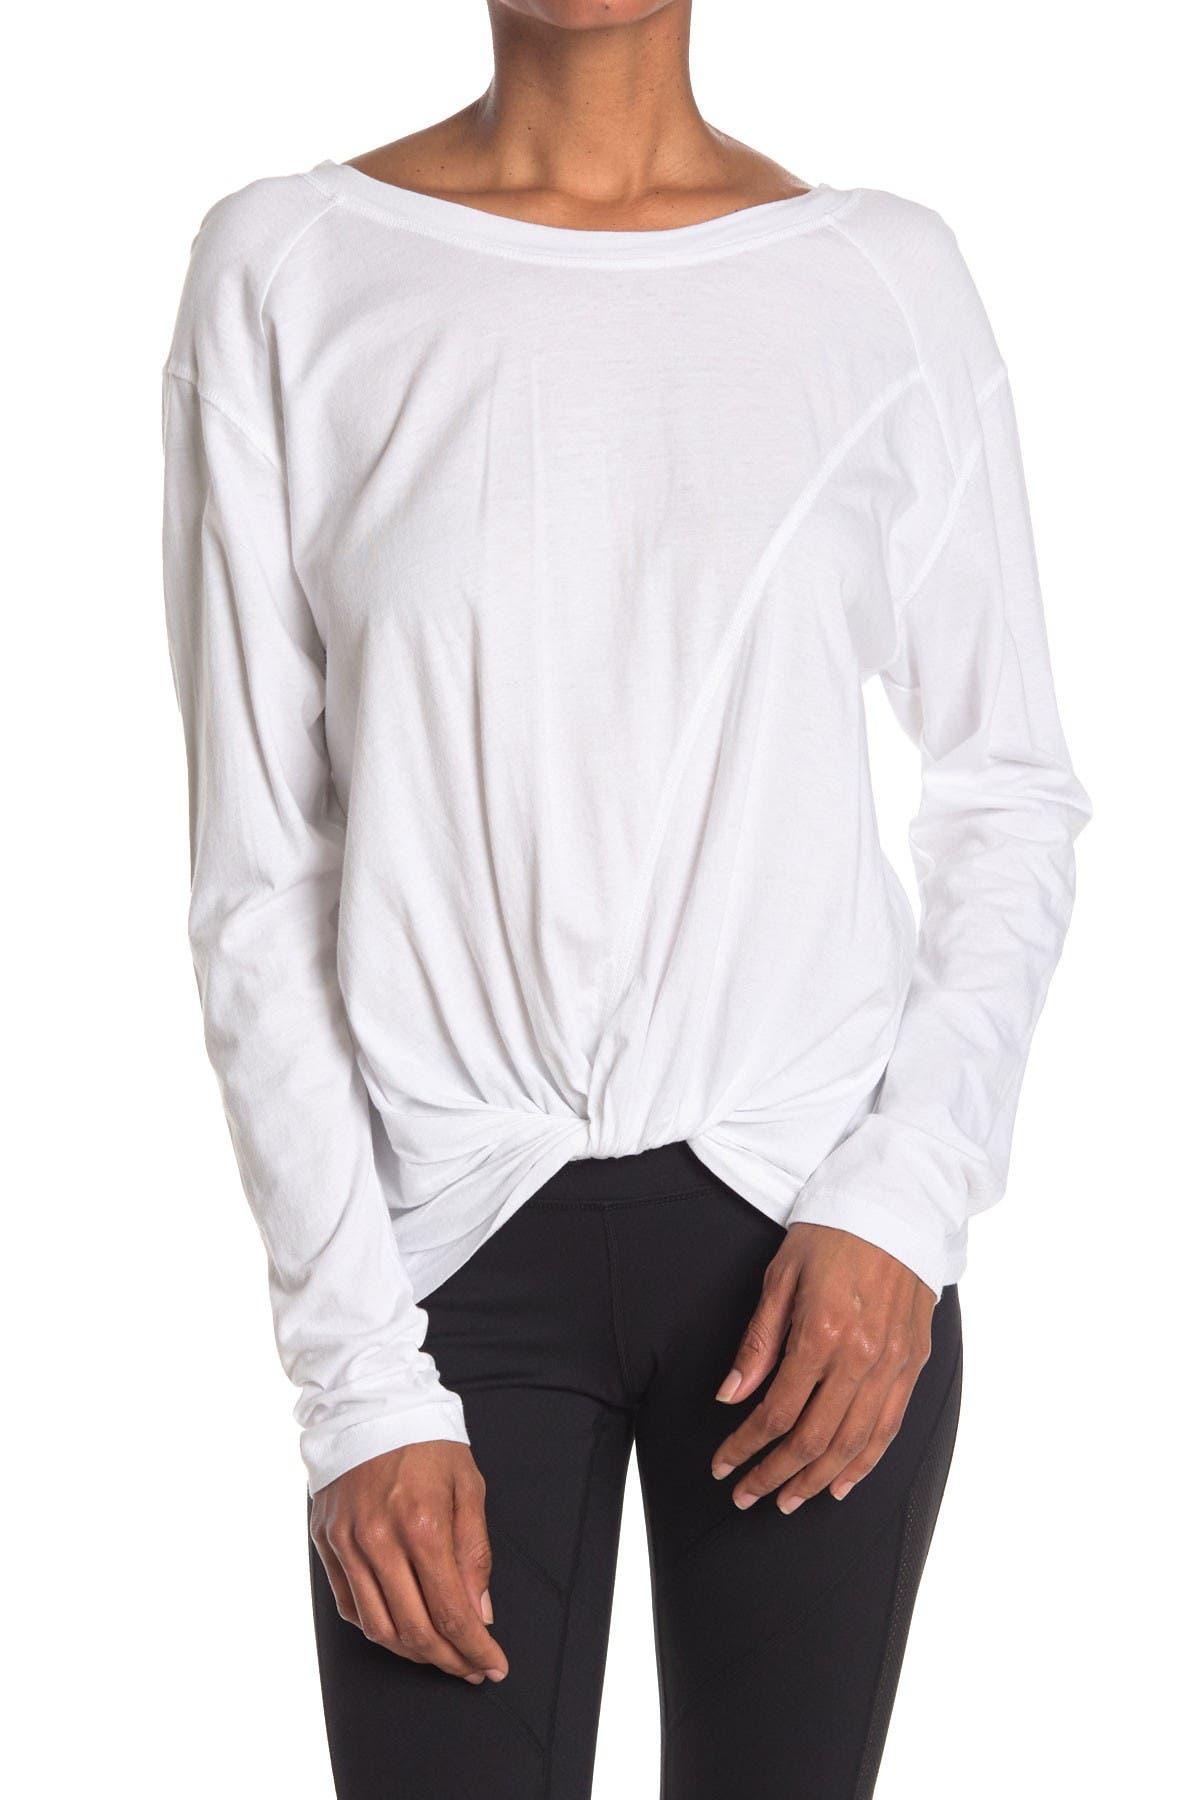 Image of Z By Zella Twist & Turn Washed Shirt